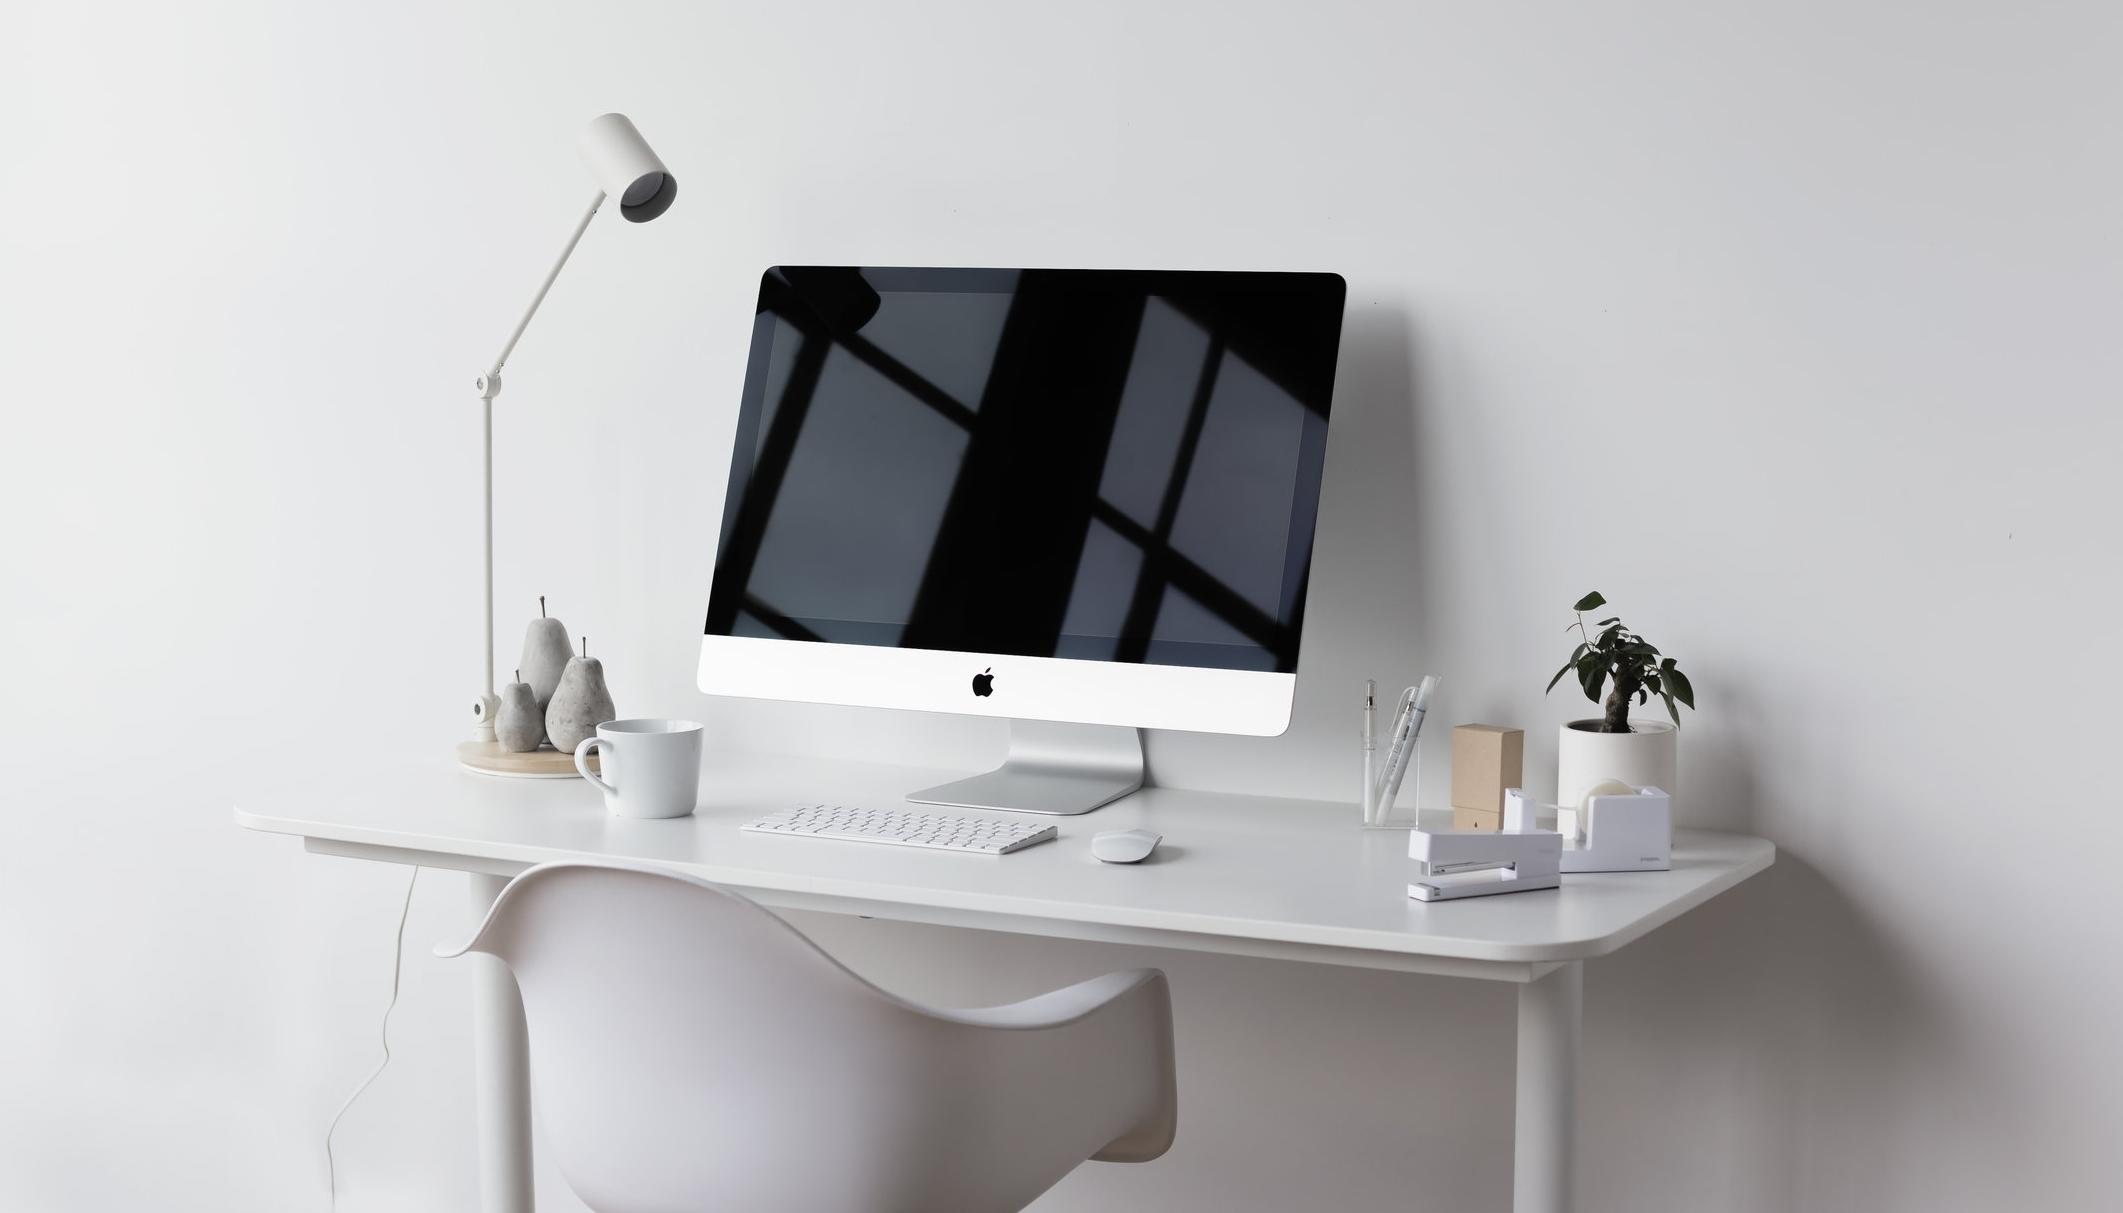 Studio_Wulf_Office_1.jpg